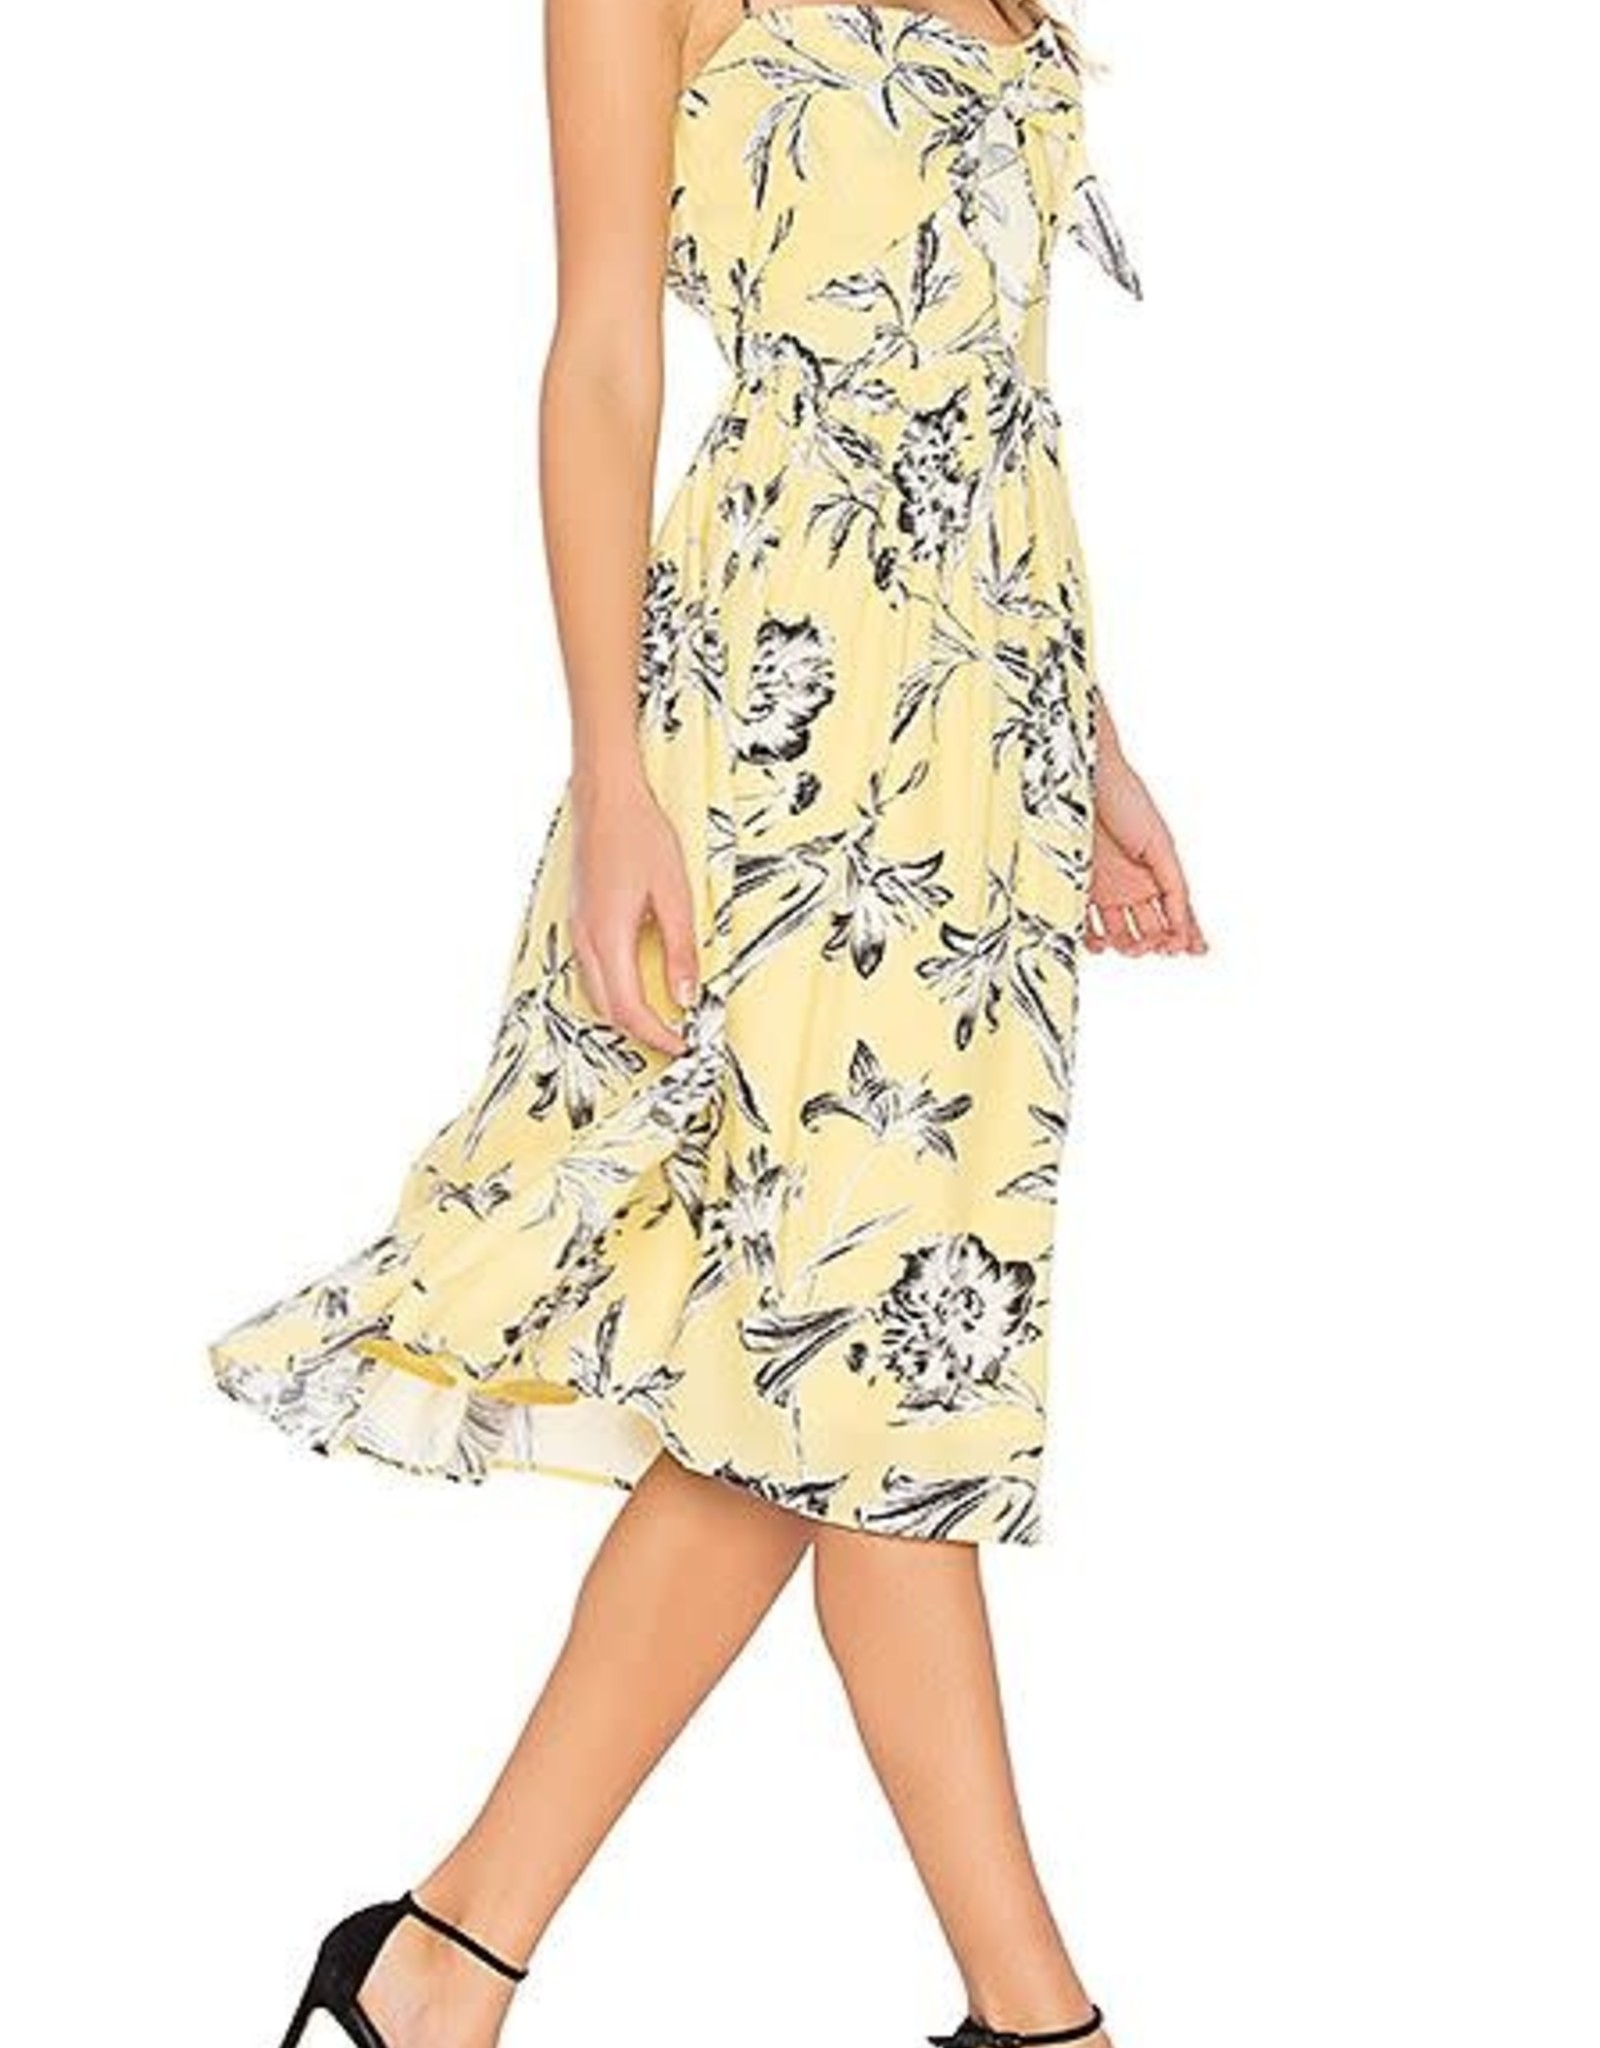 BB Dakota Yellow Floral Dress